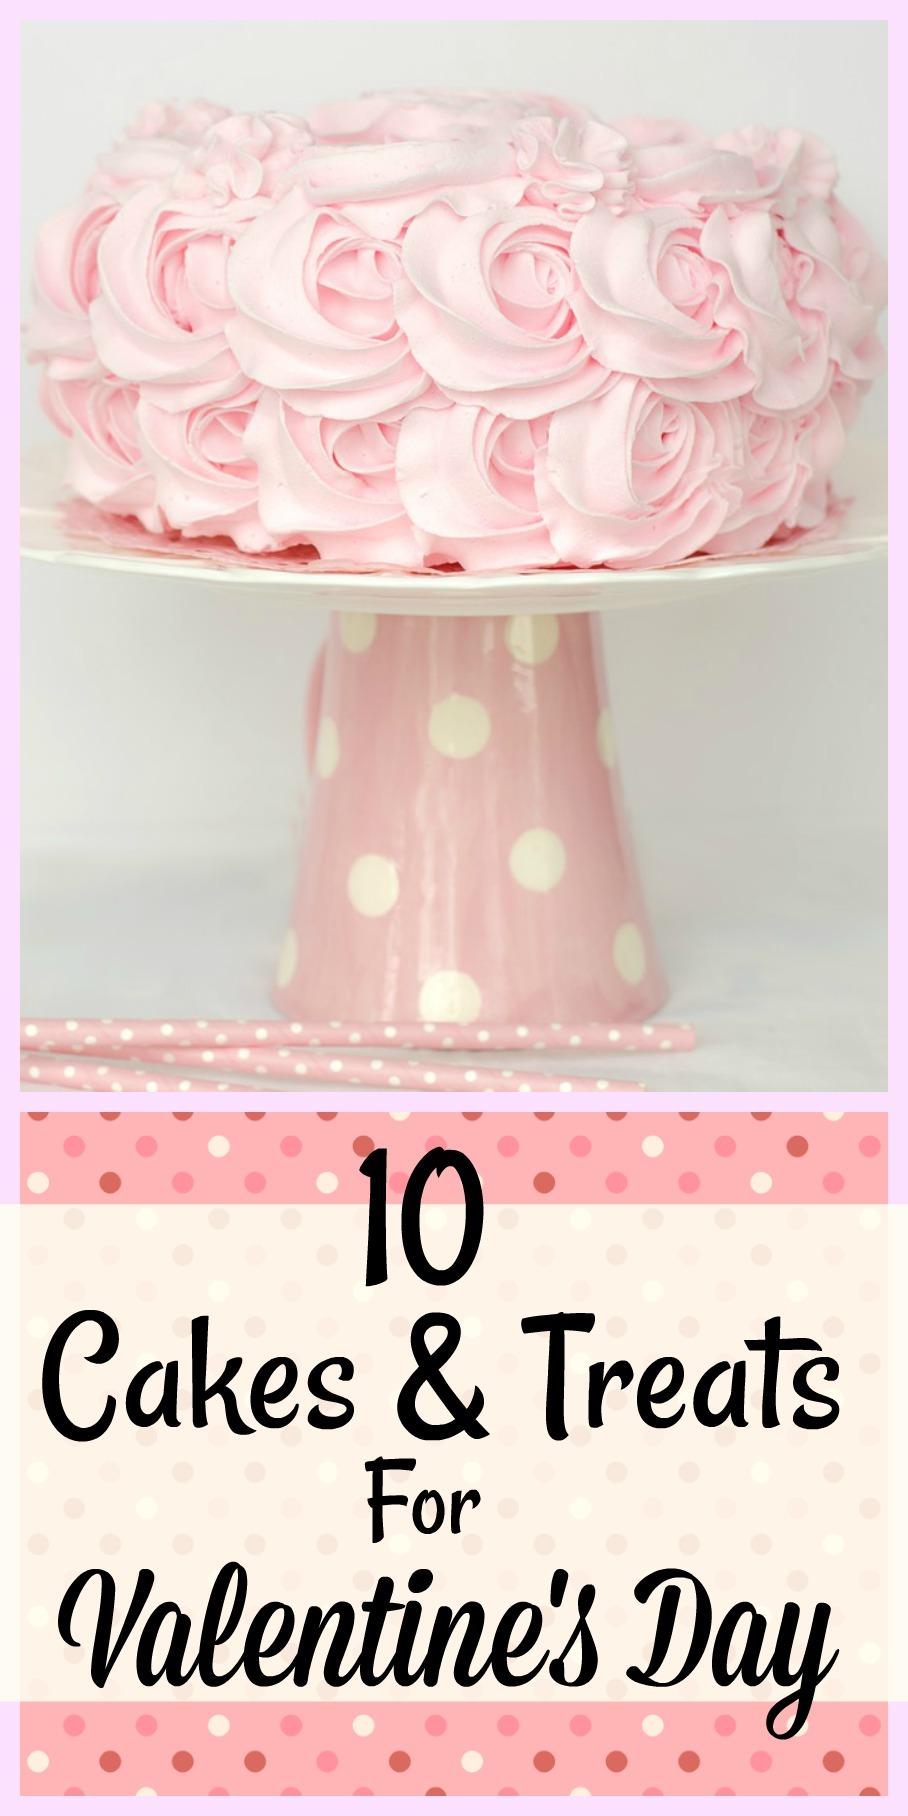 10 Cakes & Treats to Celebrate Valentine's Day